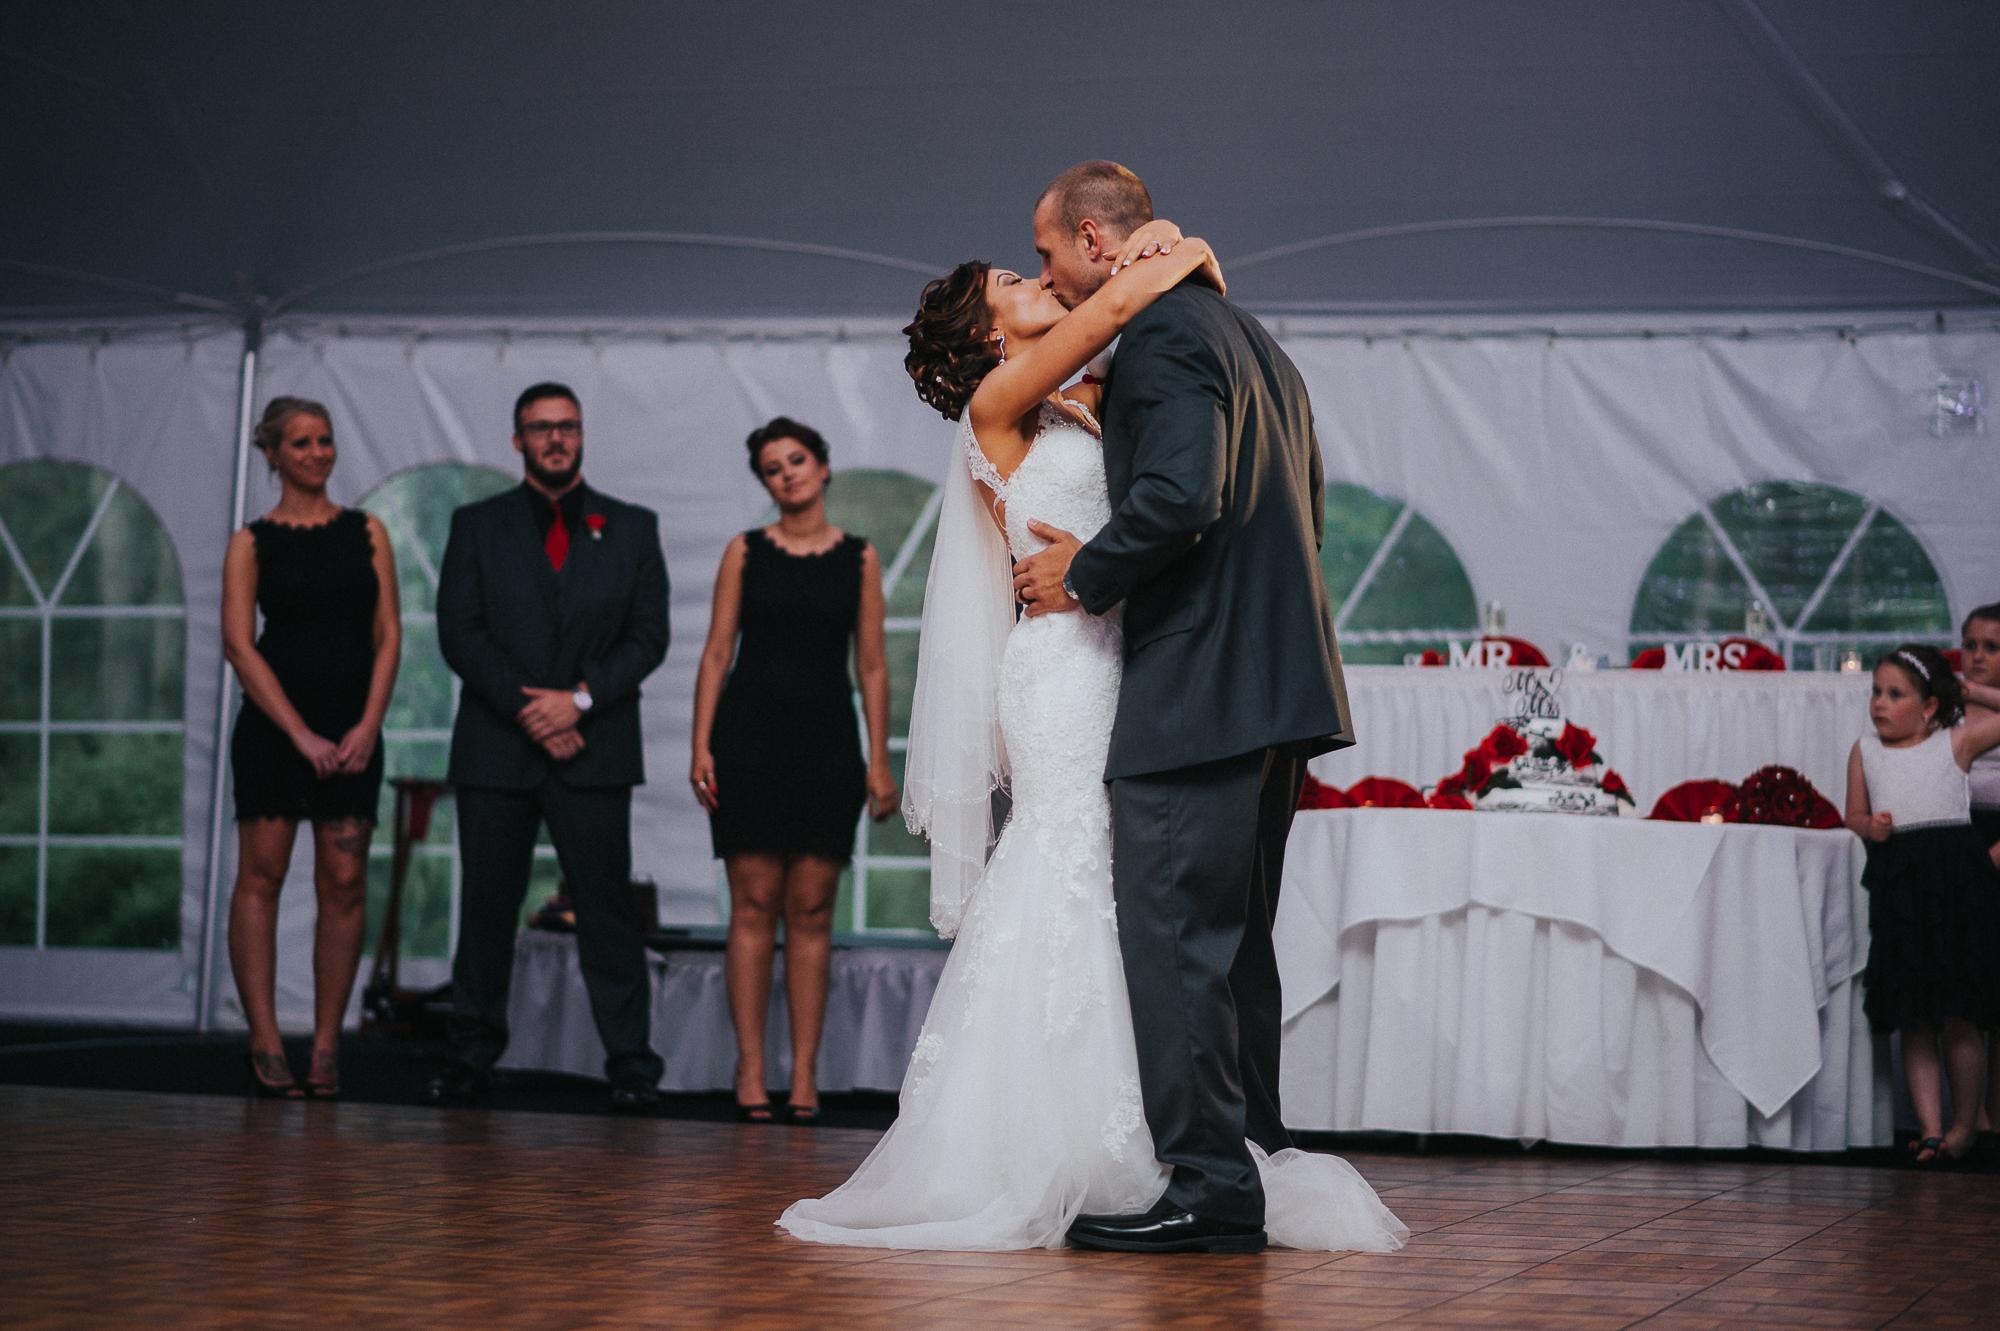 Christina-and-Gene-Wedding-Marla-Rain-Photography-487.jpg